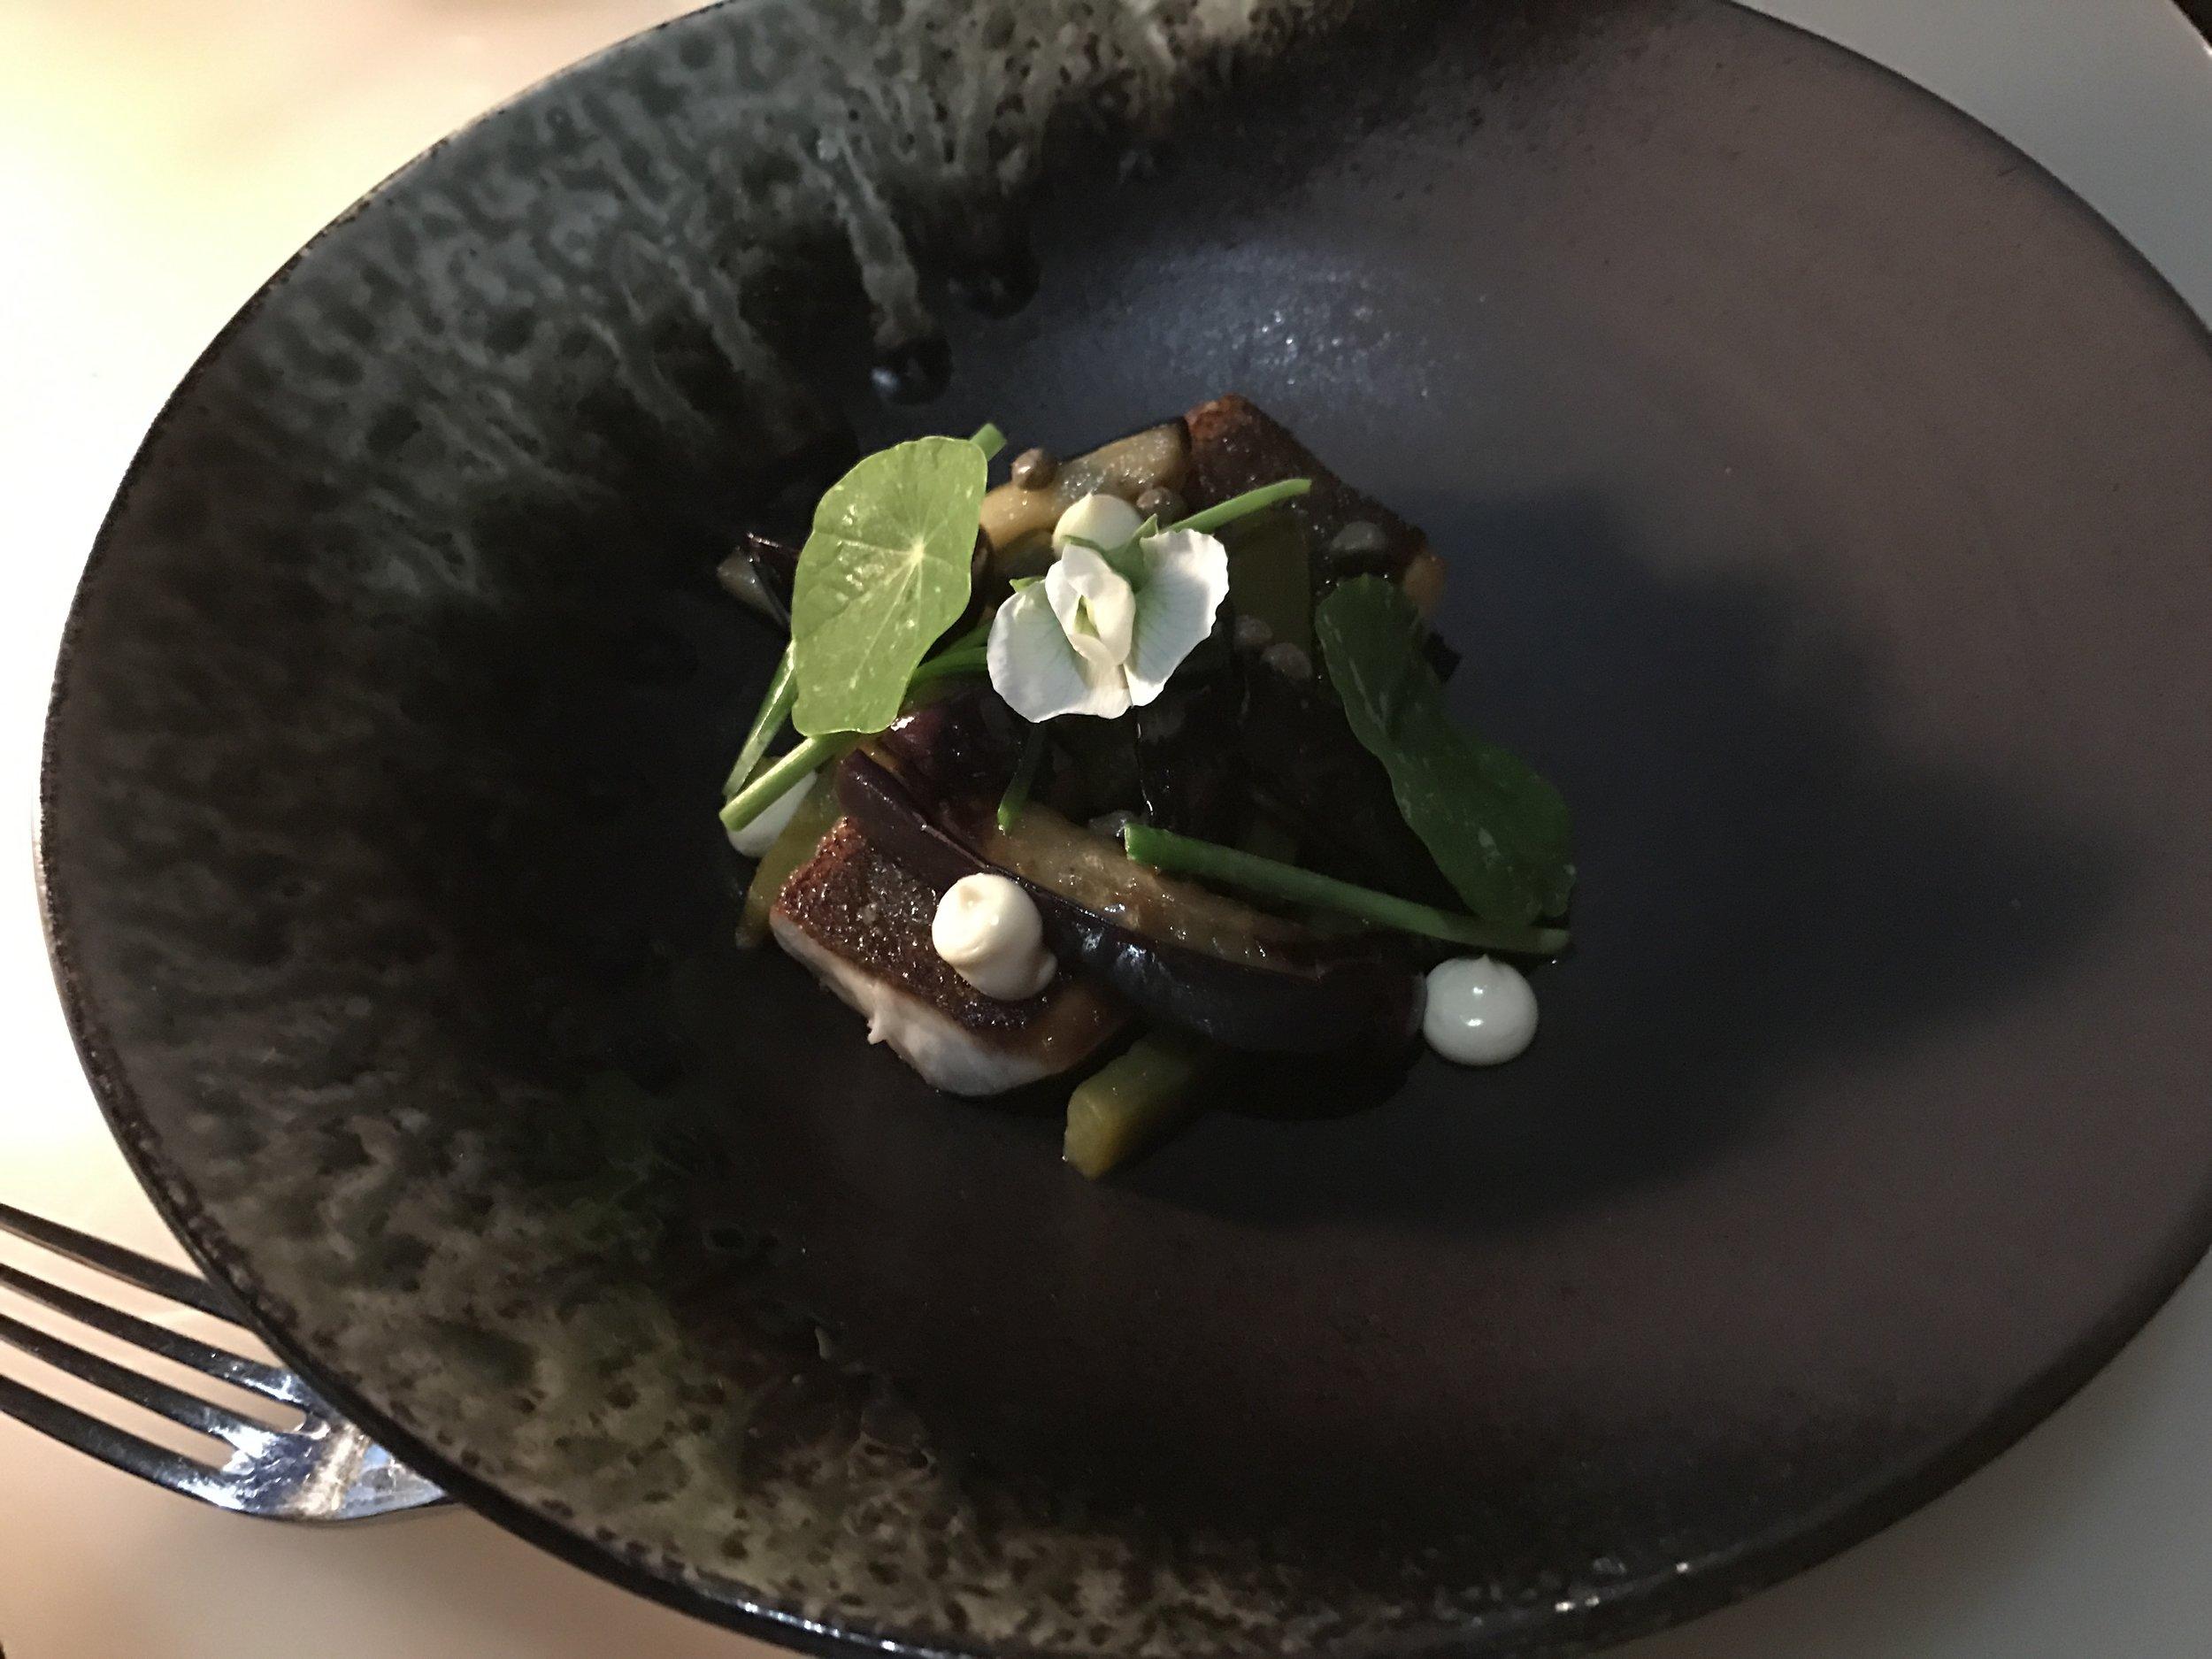 Roasted black kingfish, green capsicum, eggplant caponata, capers, and olives.